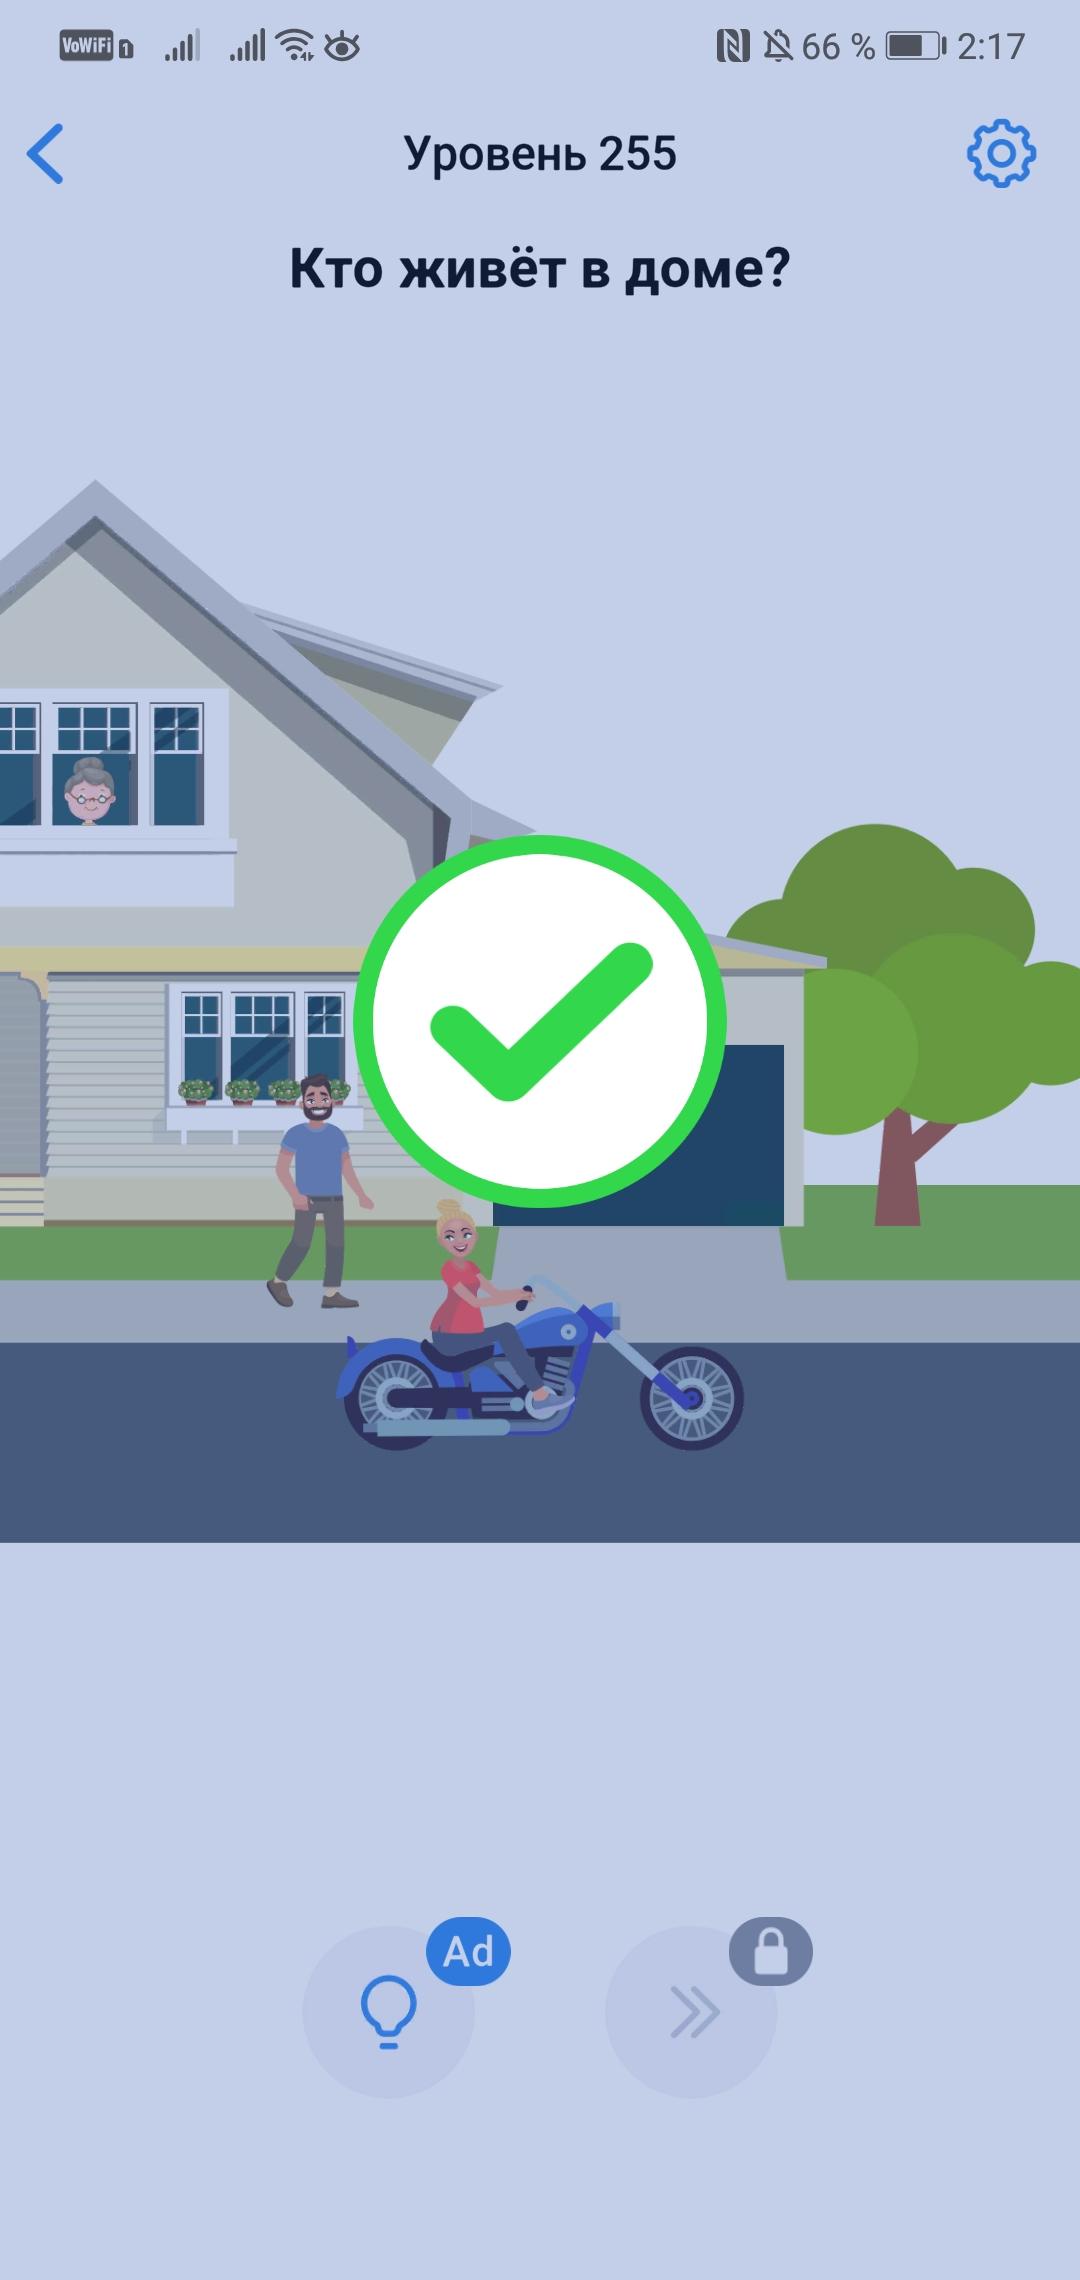 Easy Game - 255 уровень - Кто живёт в доме?